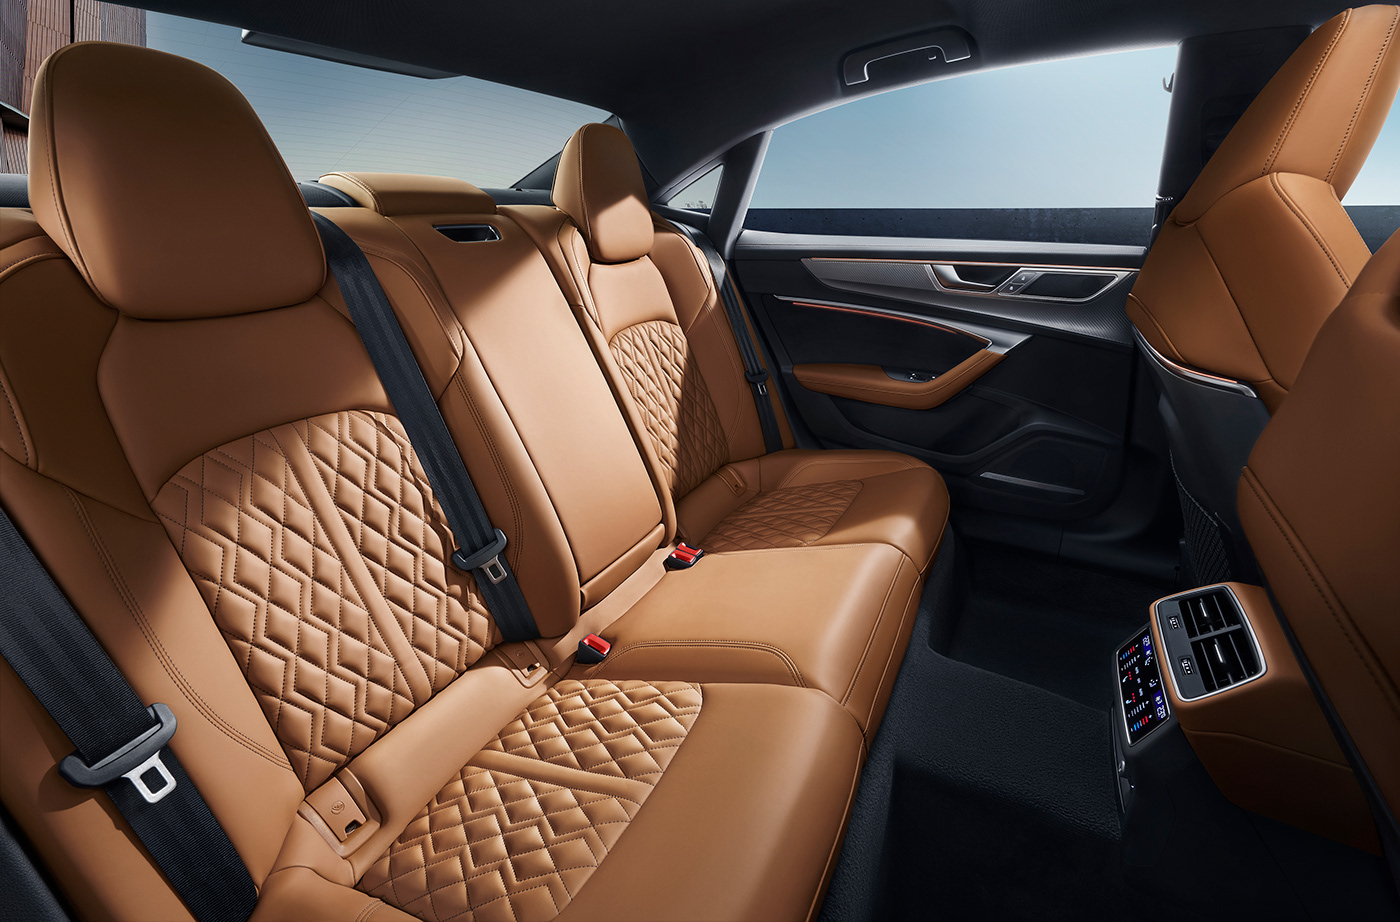 Audi,Audi A7,Audi A7L